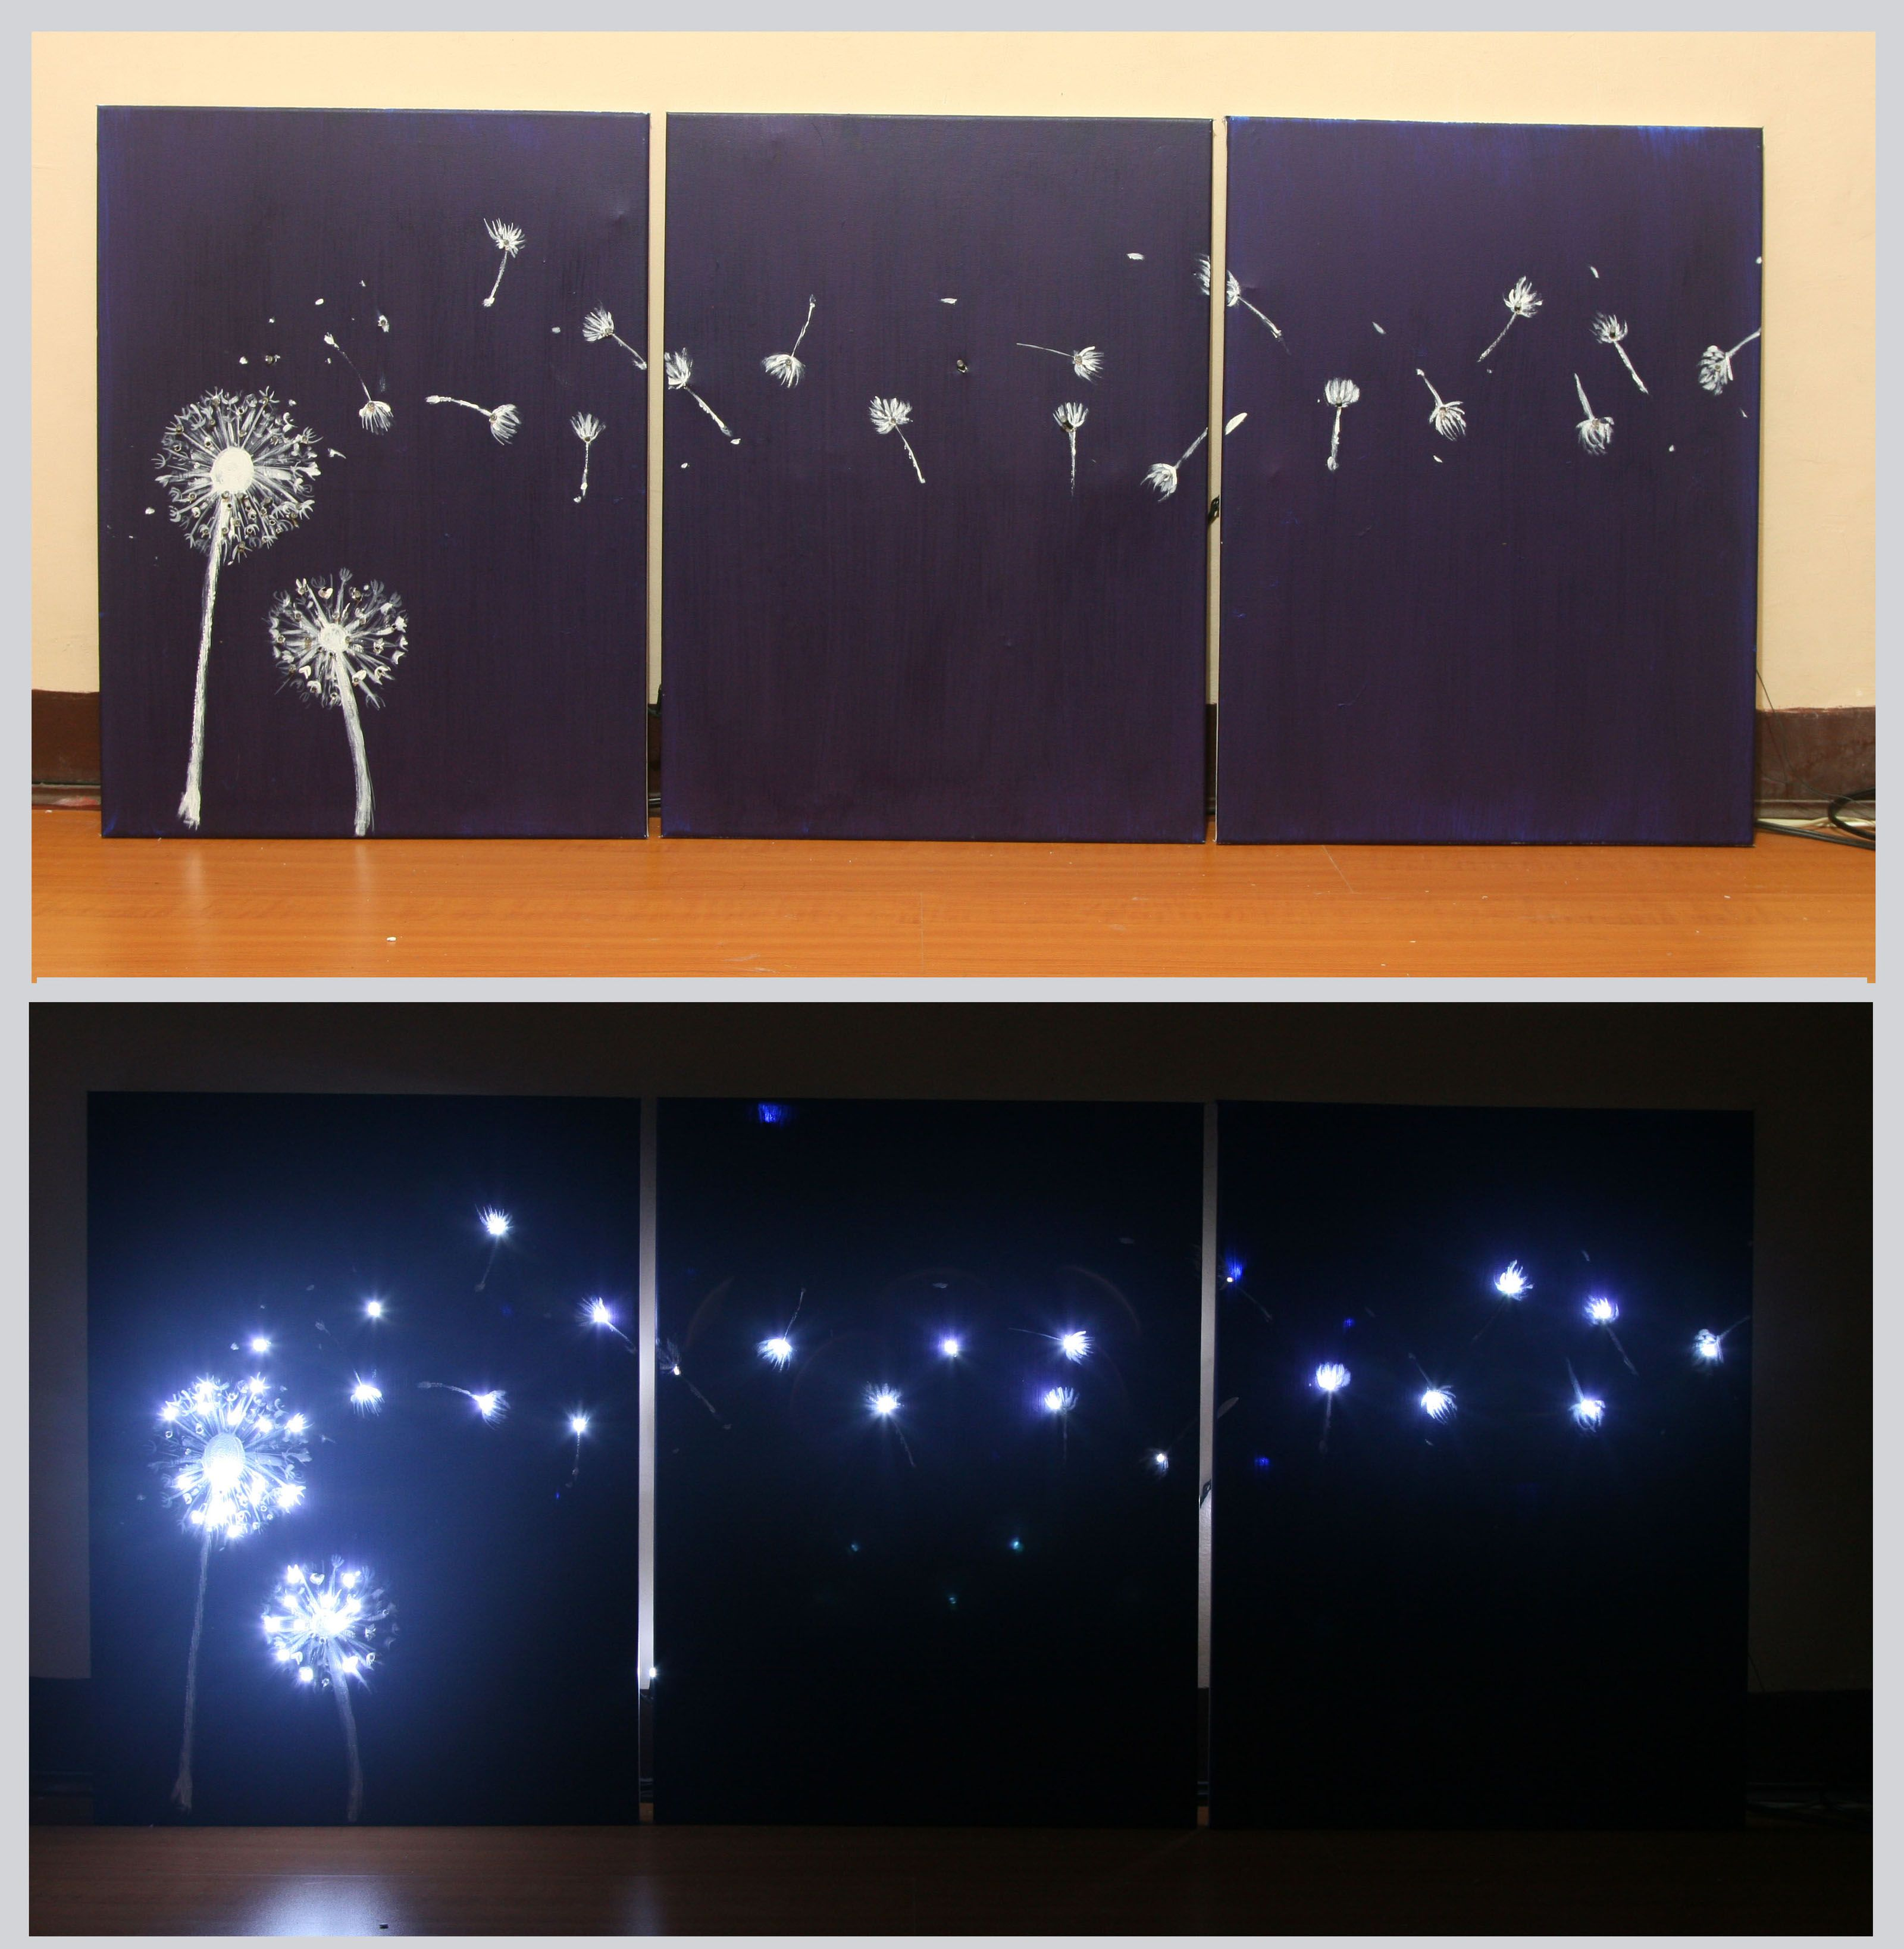 How To Design Three Panel Light Up Dandelion Wall Art Dandelion Wall Art Diy Wall Art Diy Wall